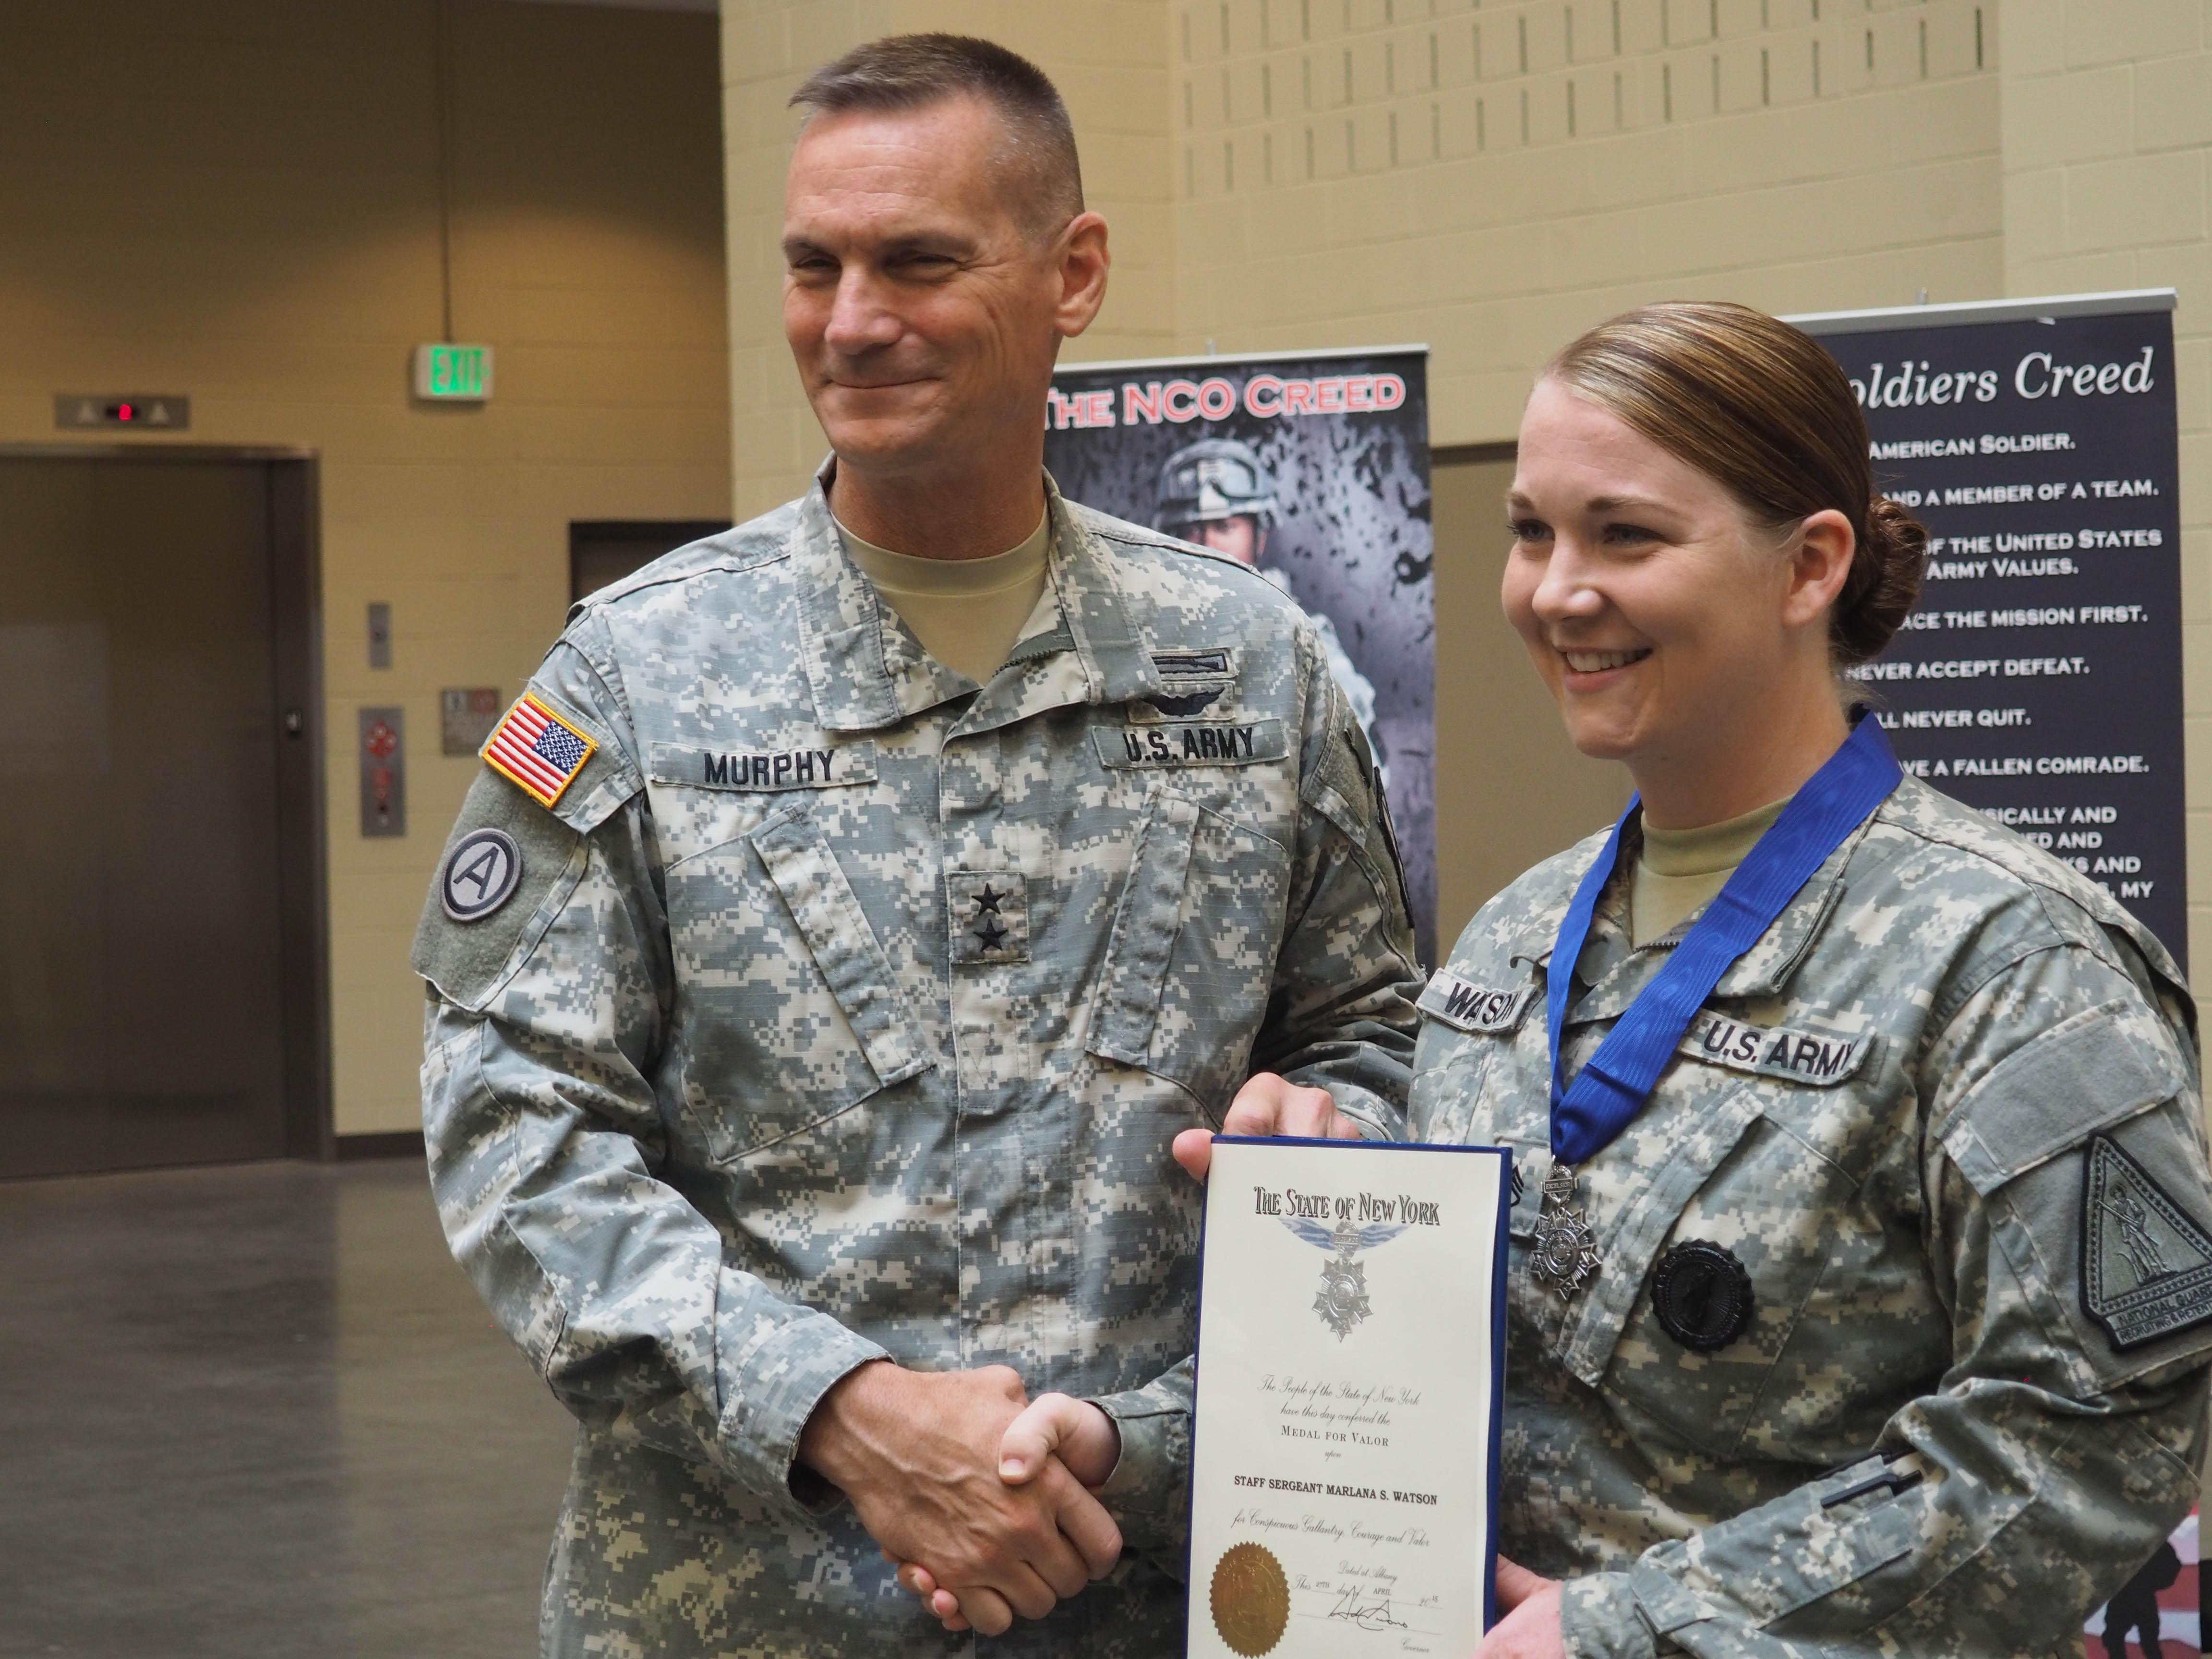 New York National Guard member honored for heroism in her own neighborhood